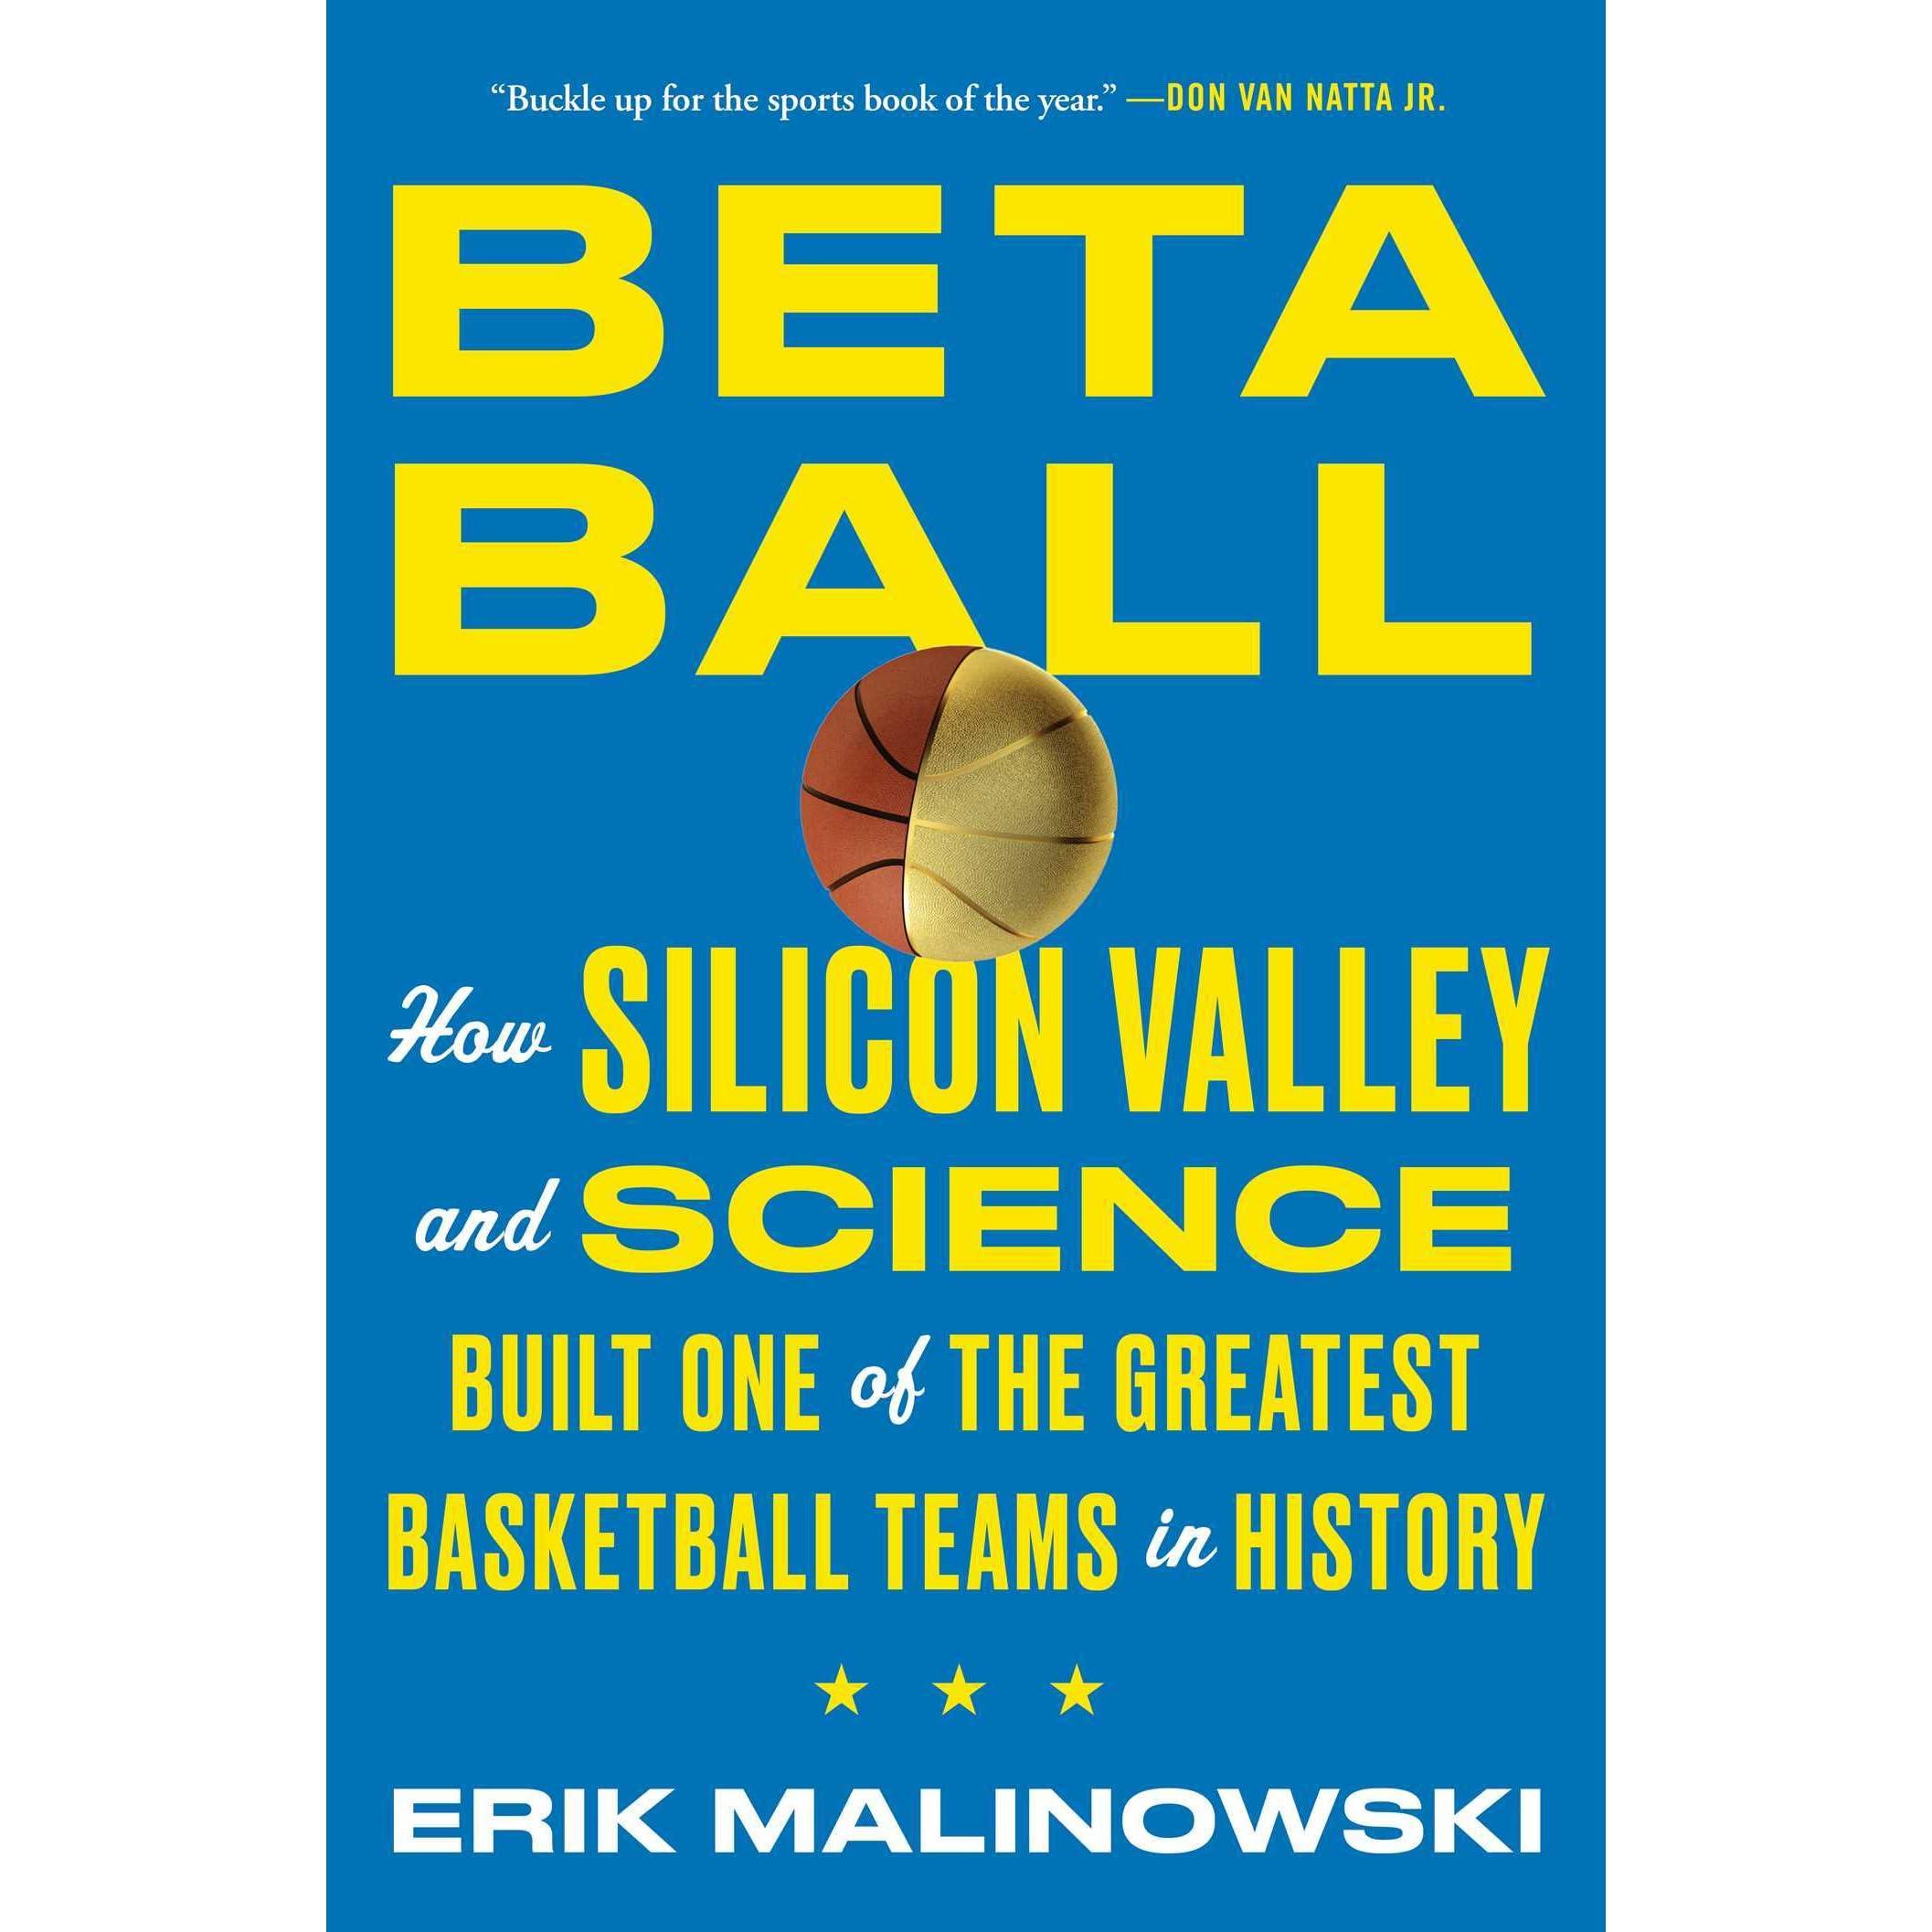 Astroball PDF Free Download